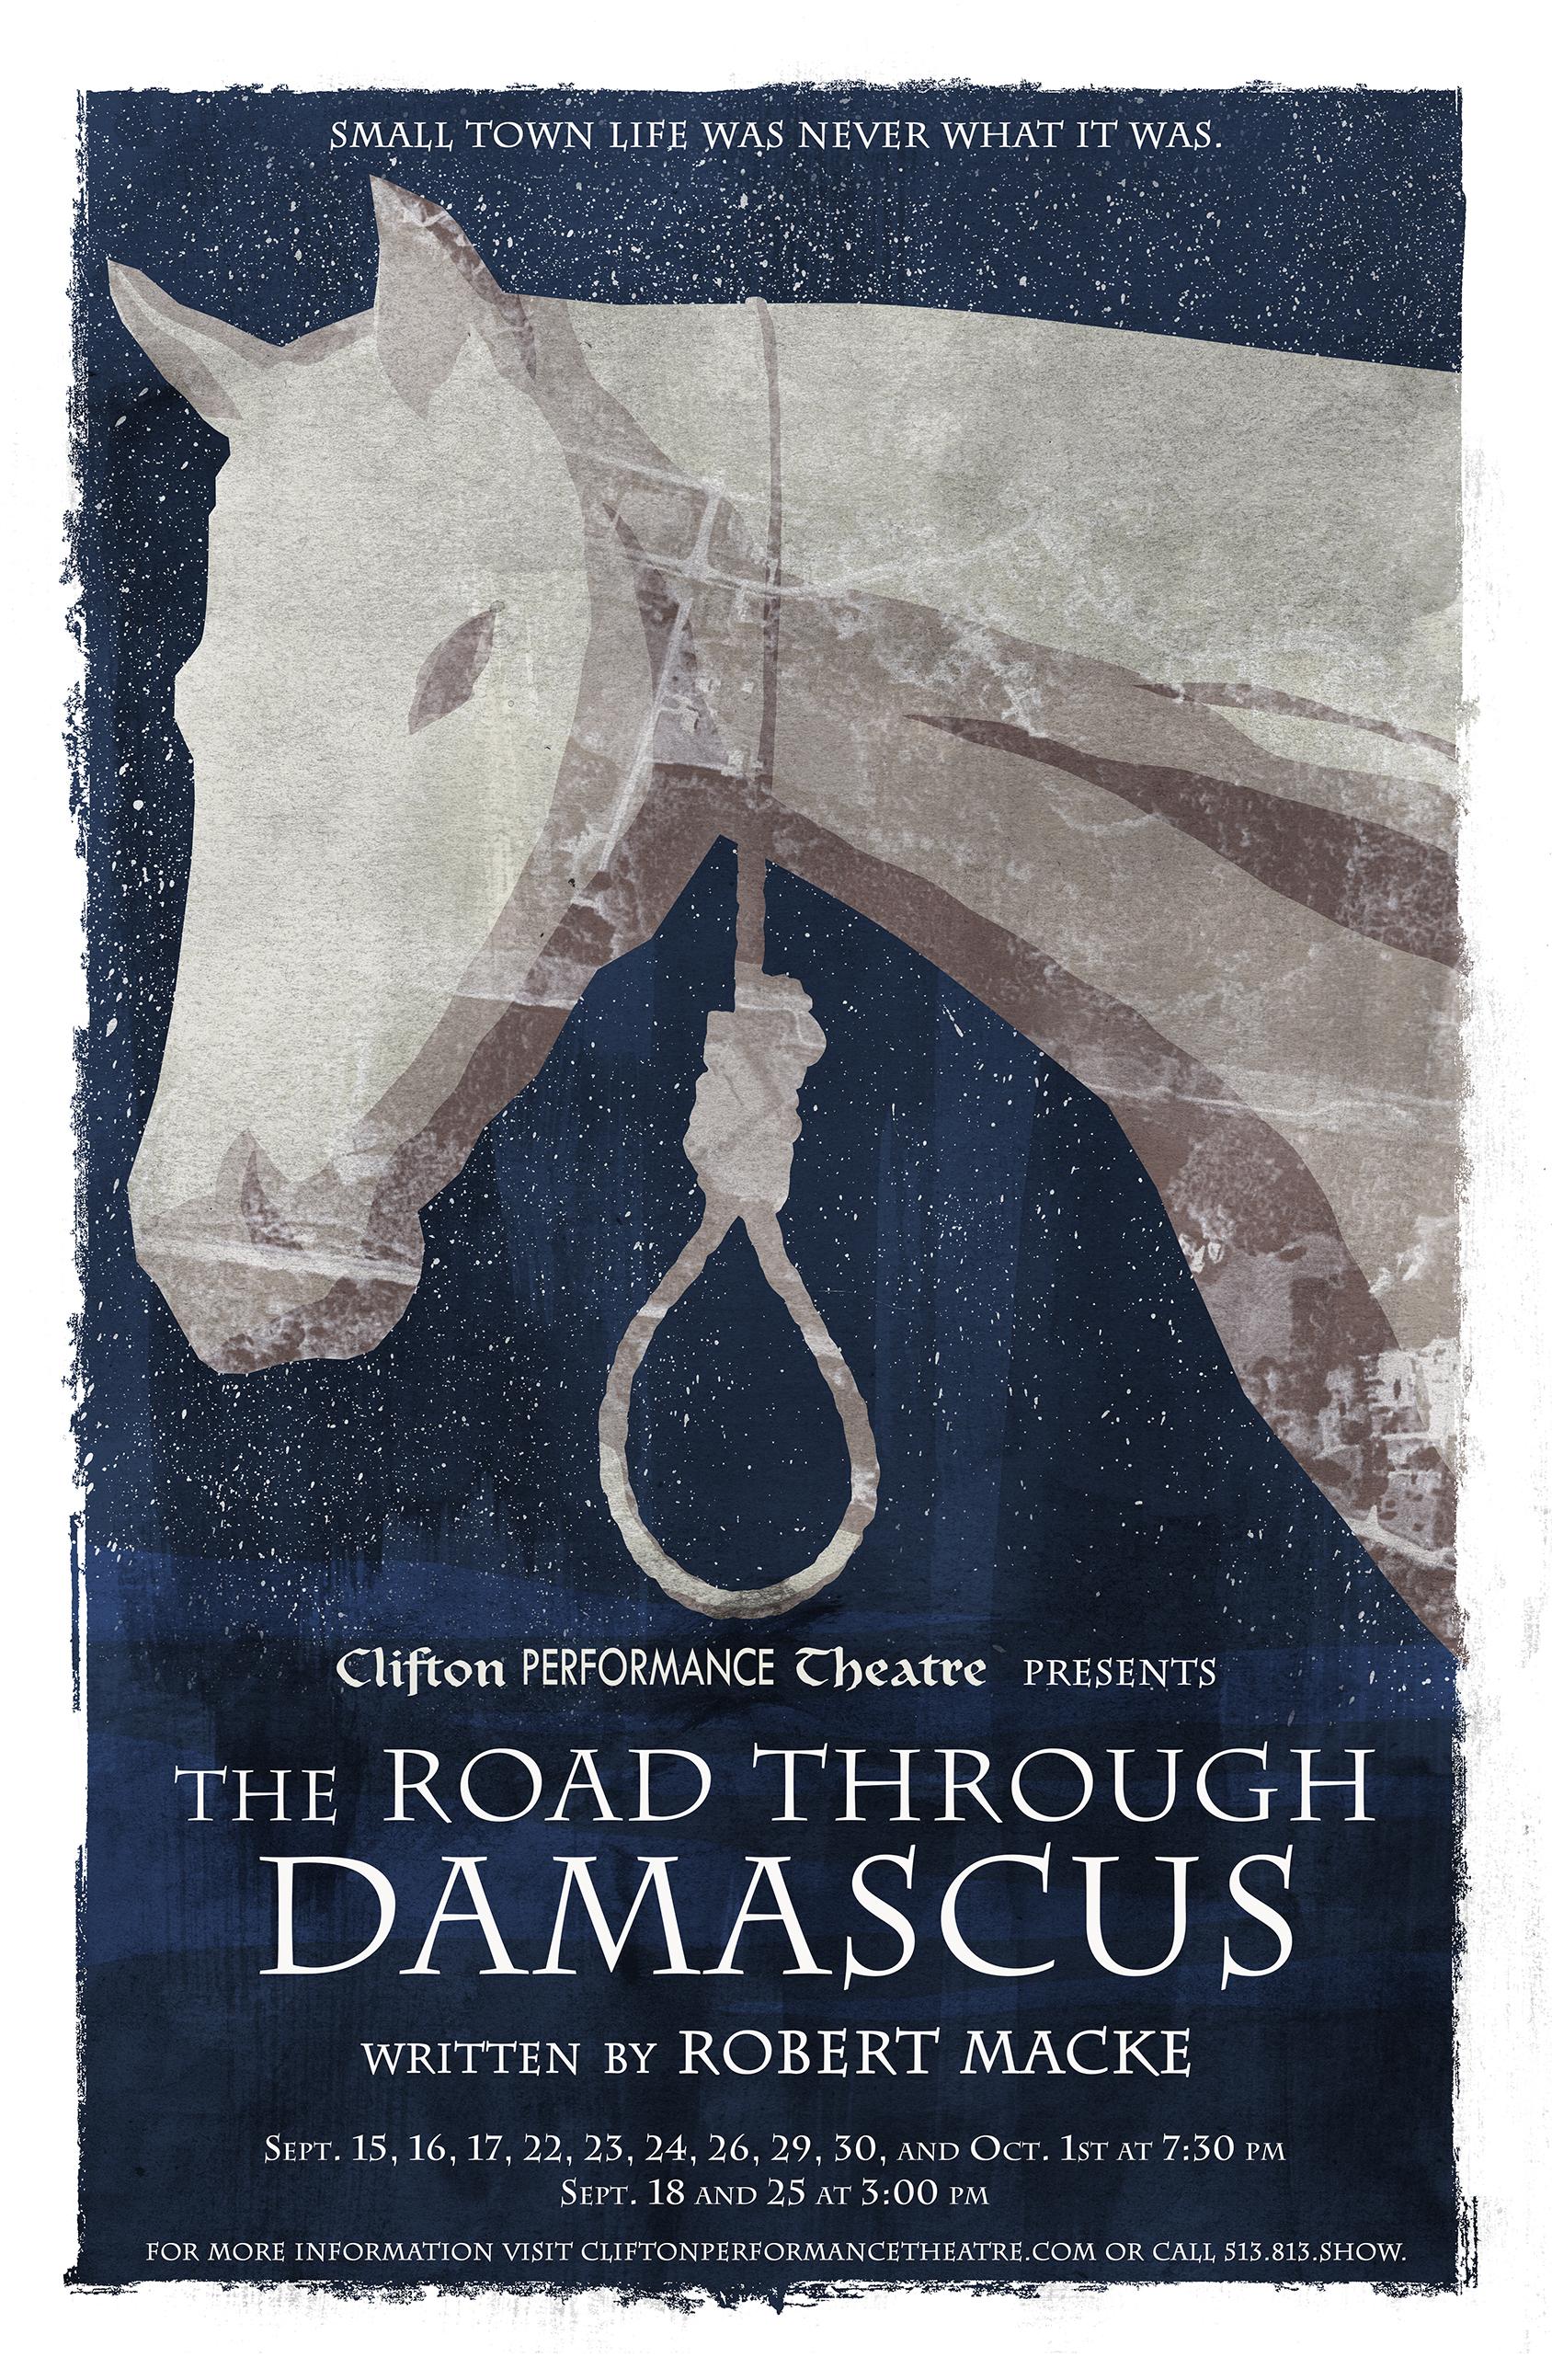 The Road Through Damascus